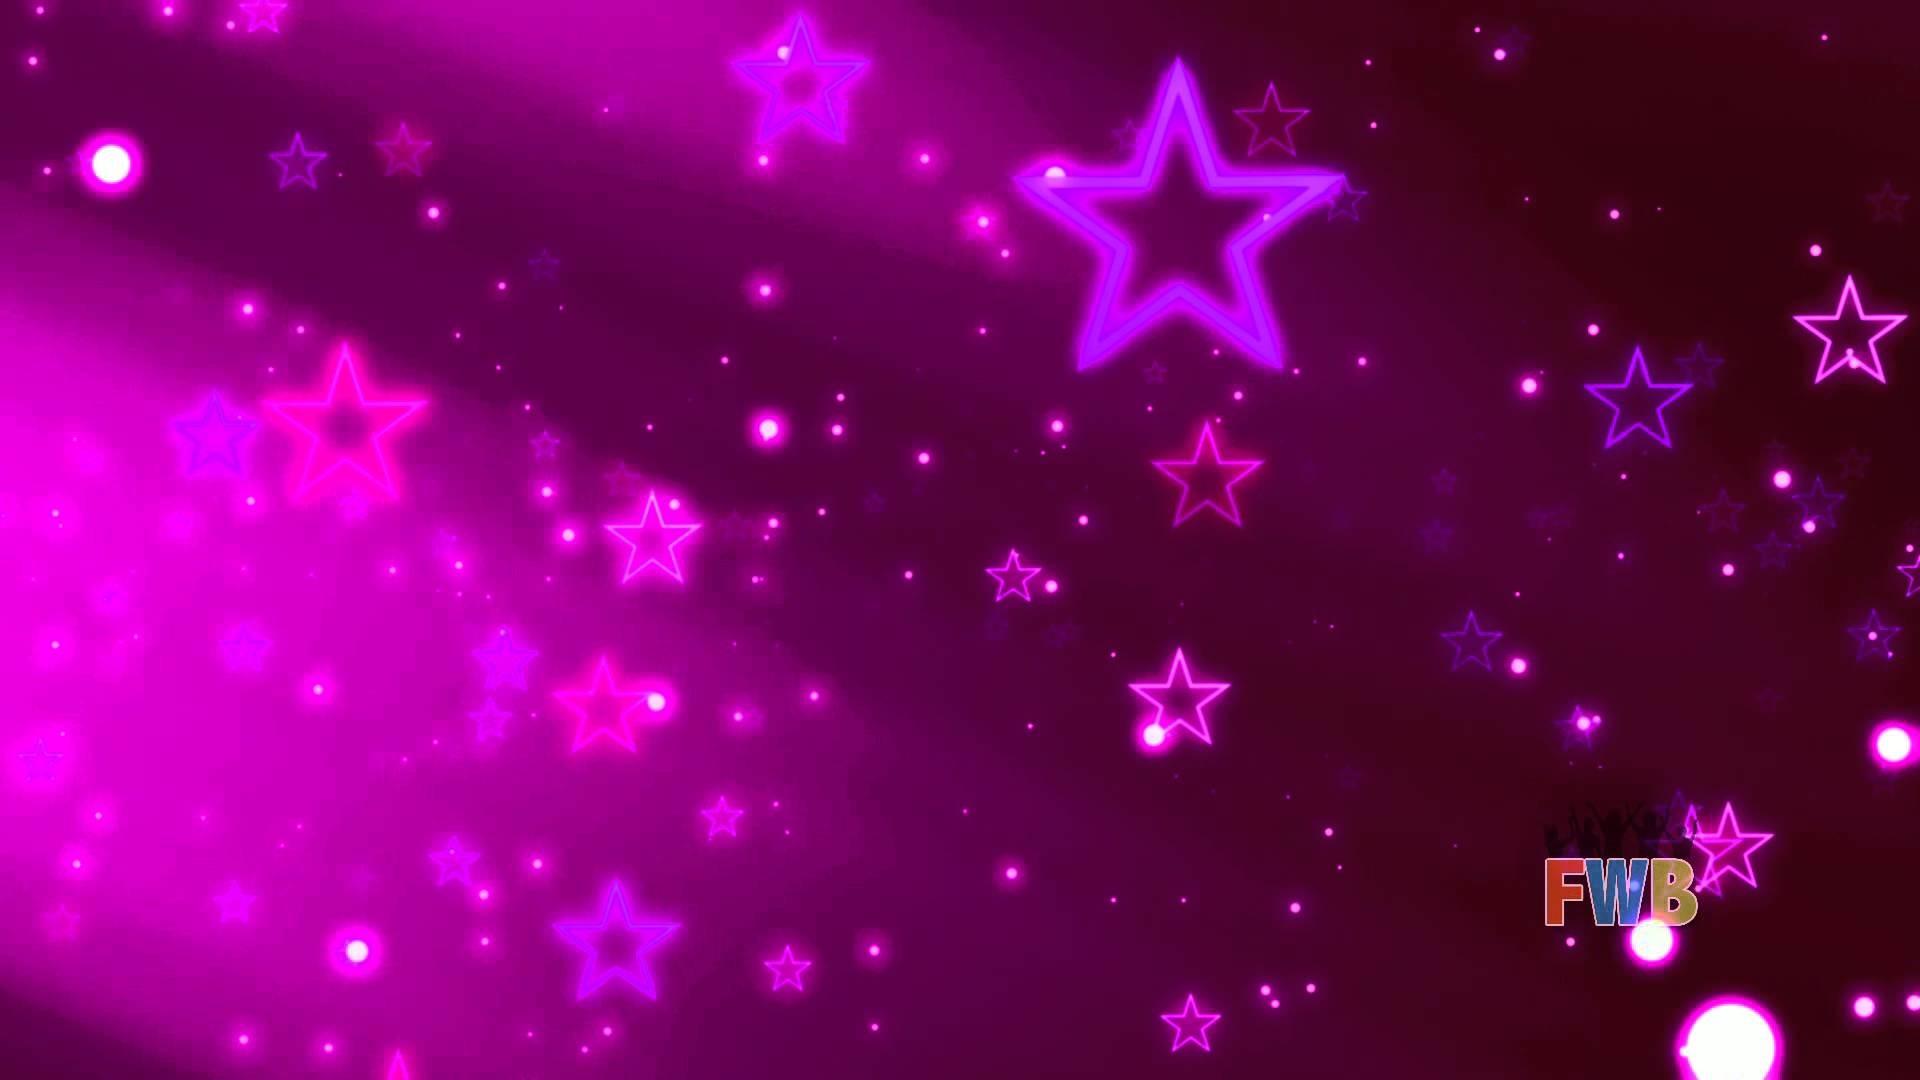 by Charlot Gantz Wallpaper for PC: Animated Stars